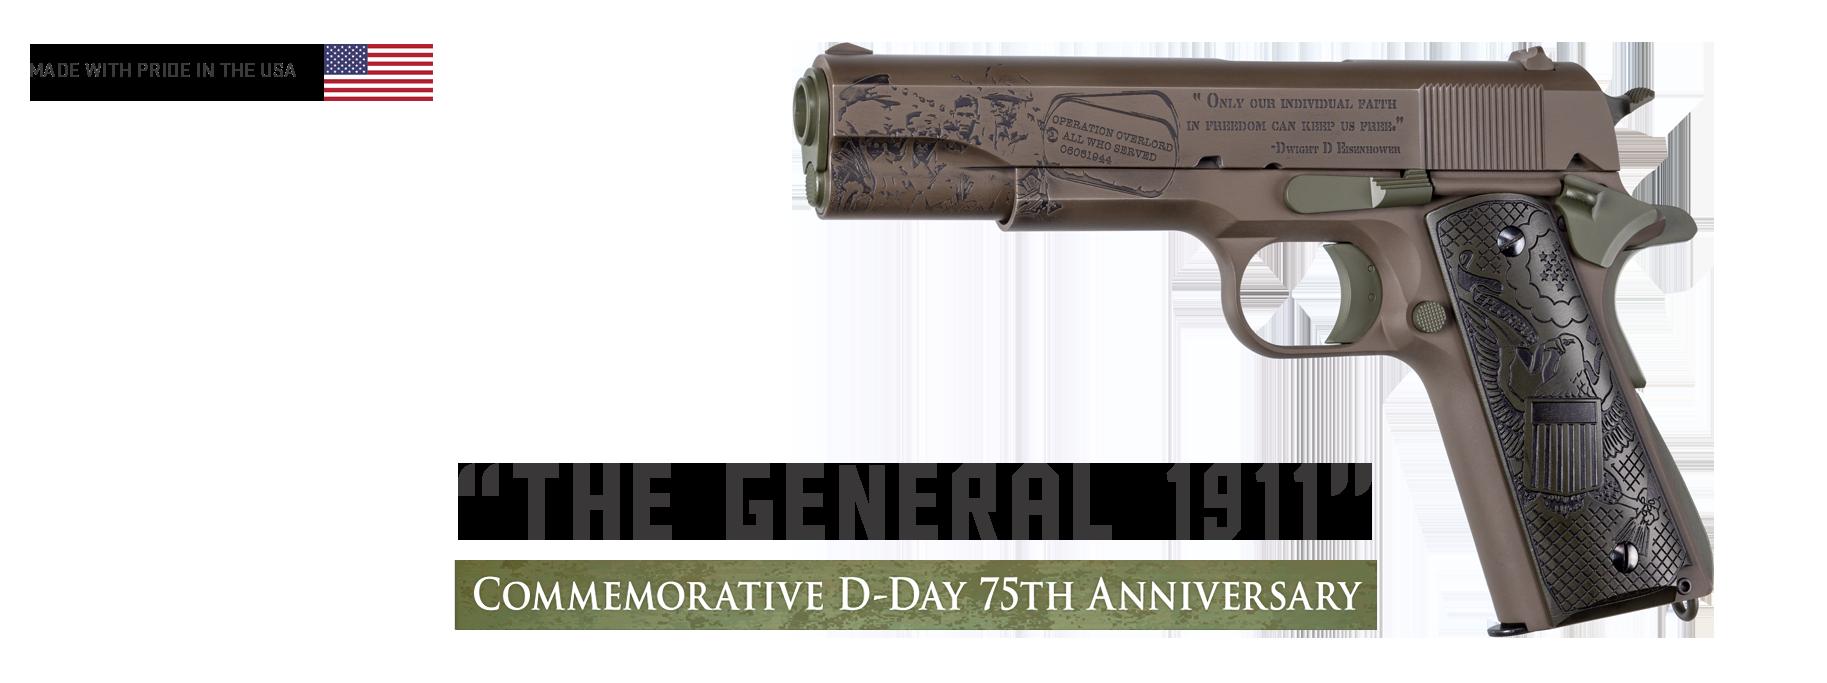 General 1911 - Auto-Ordnance | Original manufacturer of the